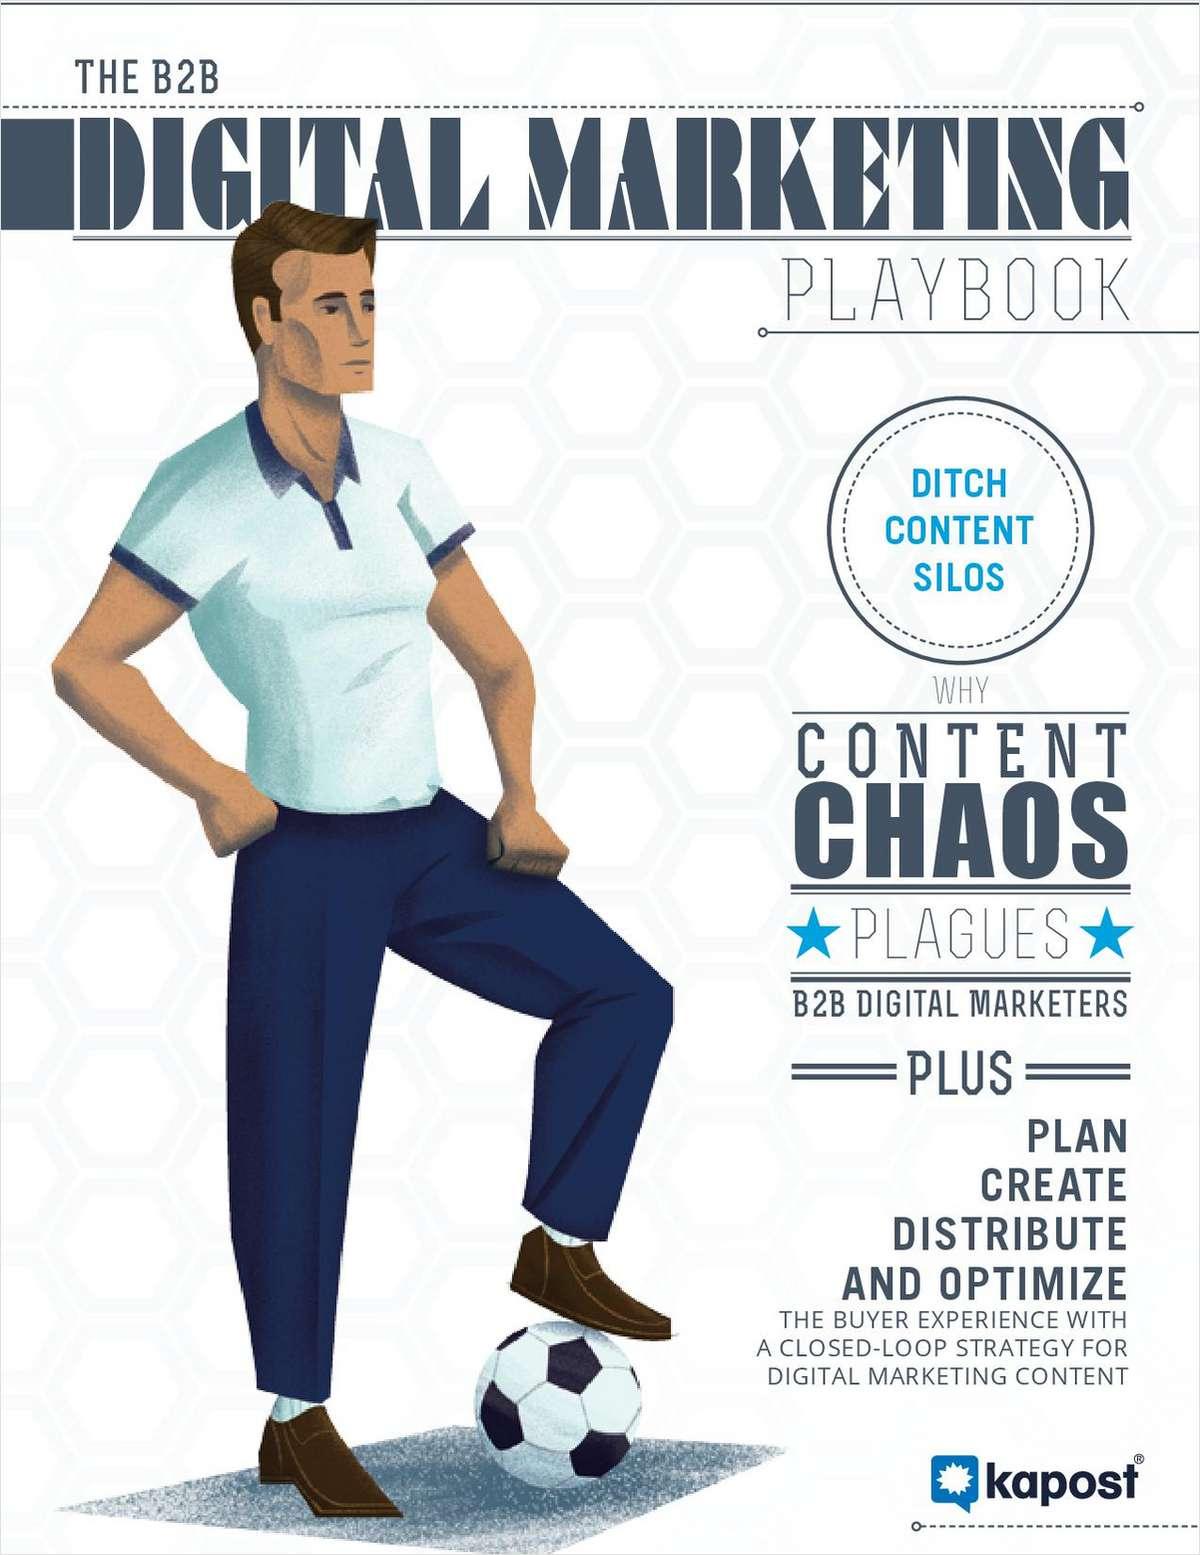 The B2B Digital Marketing Playbook